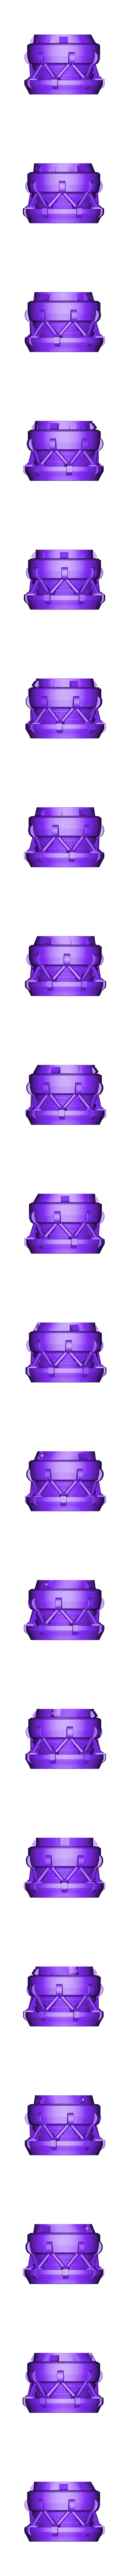 StarWalker_top.obj Download free OBJ file The StarWalker • 3D print design, AlbertThePrintingMachine